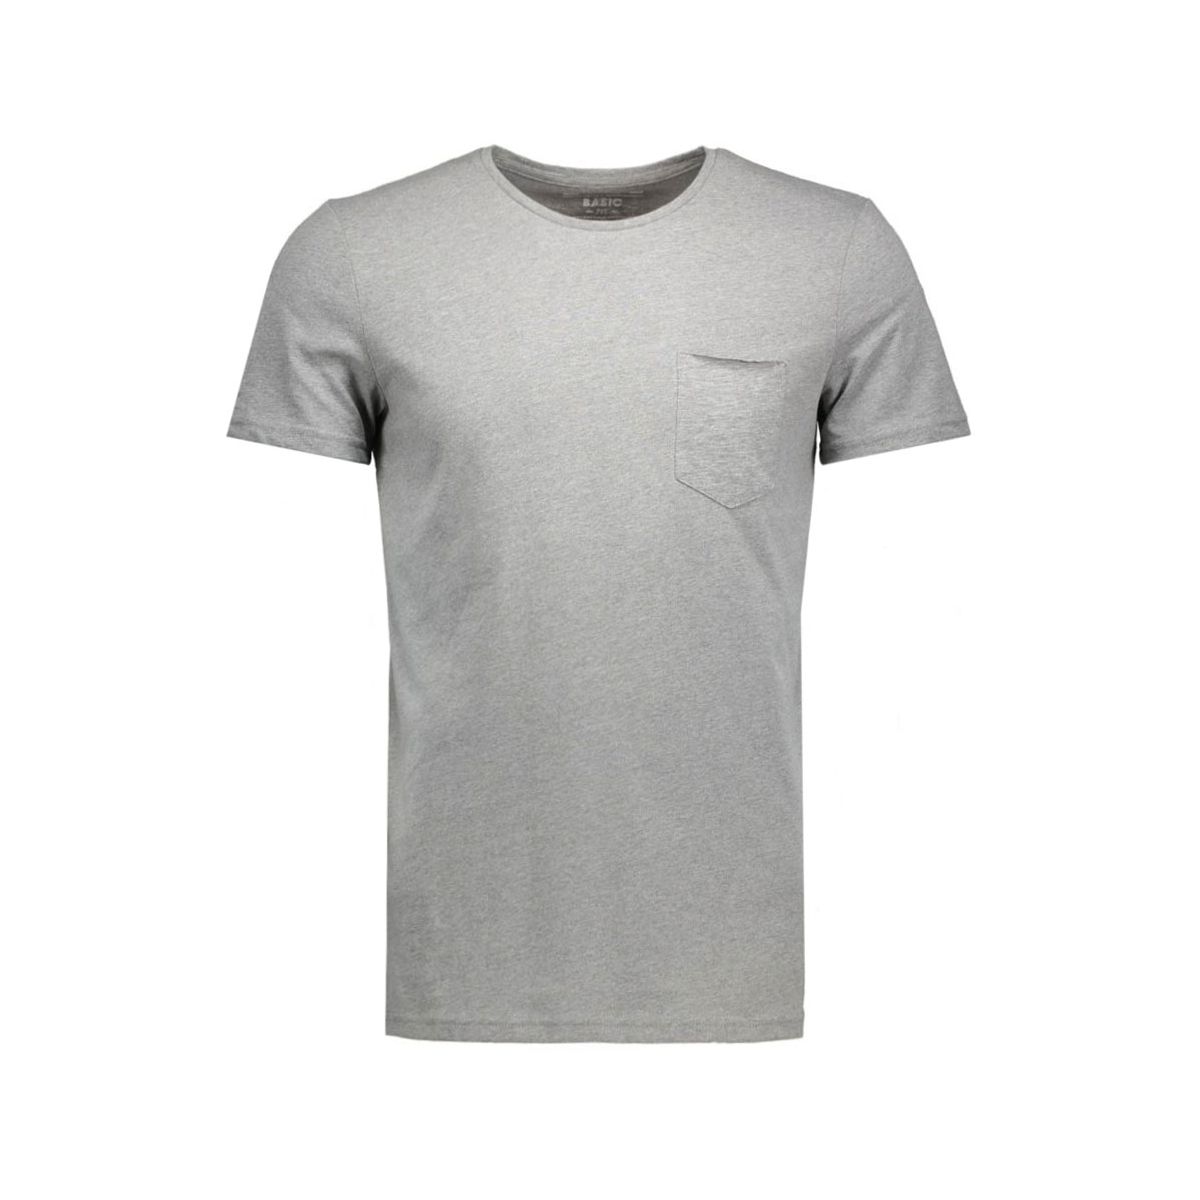 1035309.09.12 tom tailor t-shirt 2803